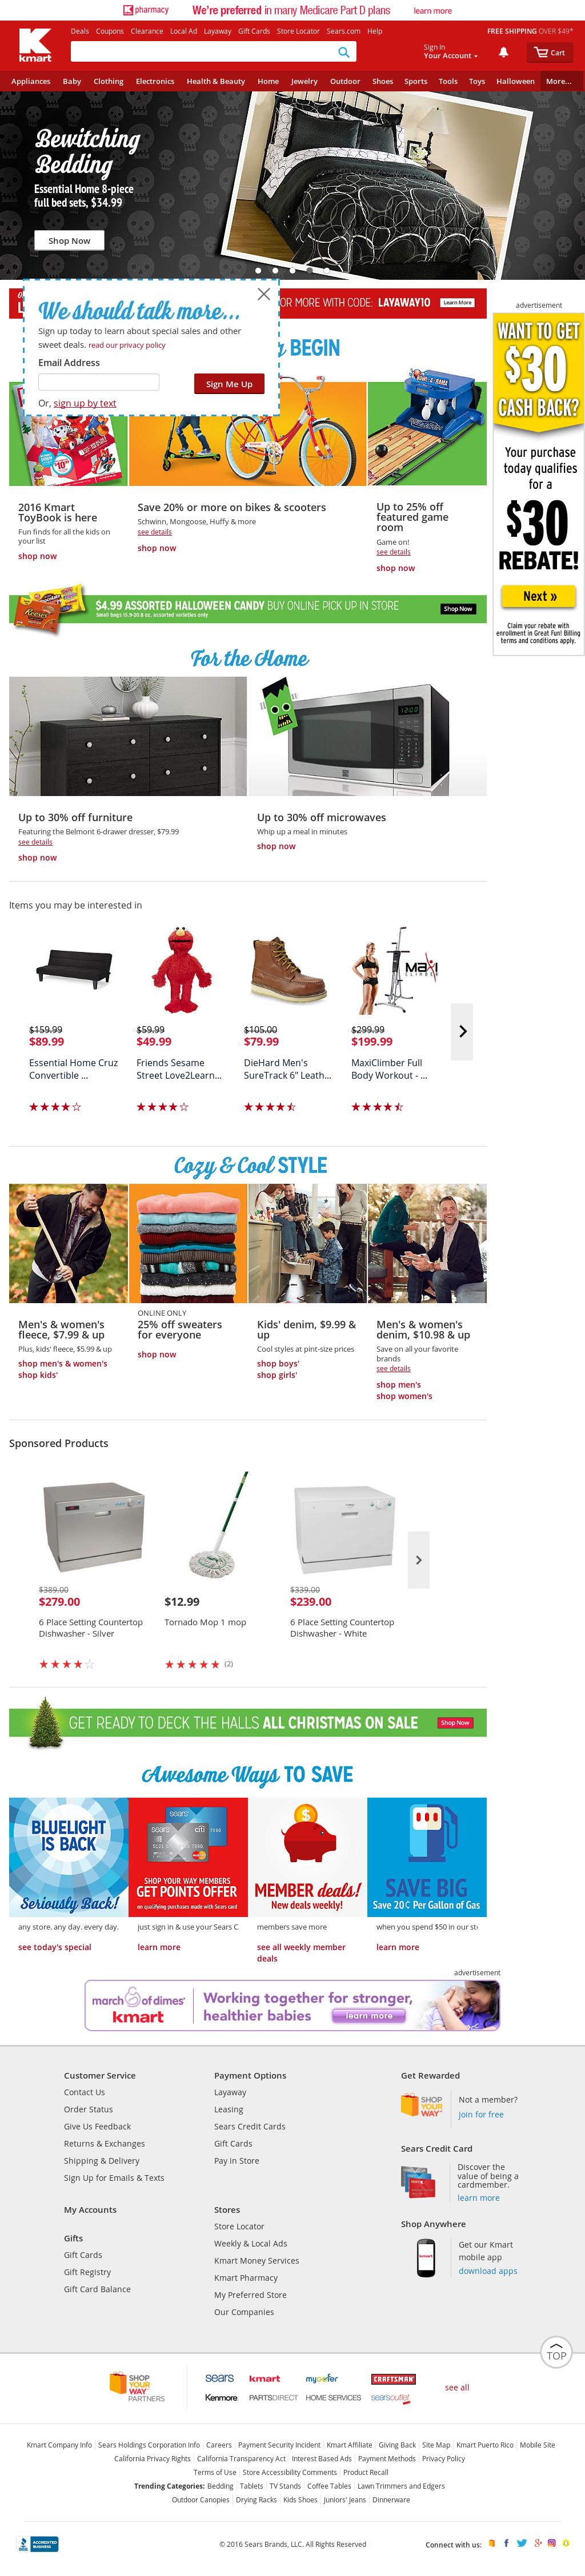 Kmart website : Find a jcpenney